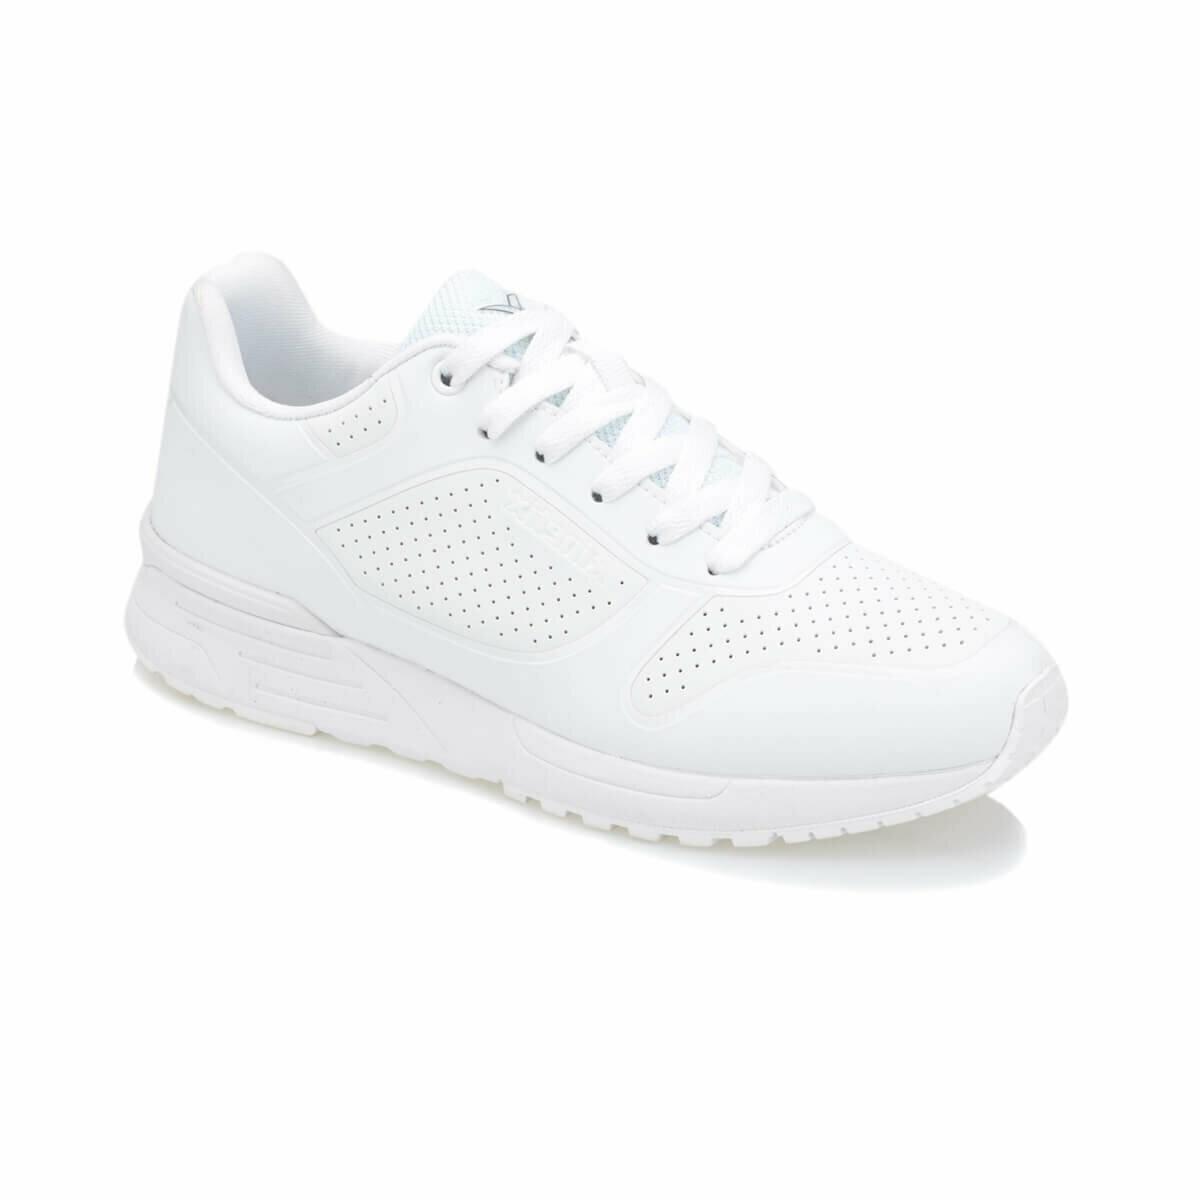 FLO Shoes Woman Sneakers White Platform Trainers Women Shoe Casual Tenis Feminino Zapatos De Mujer Zapatillas Womens Sneaker Basket Soft Breathable Fashion Footwear Shoes Кроссовки женские NORTON W KINETIX